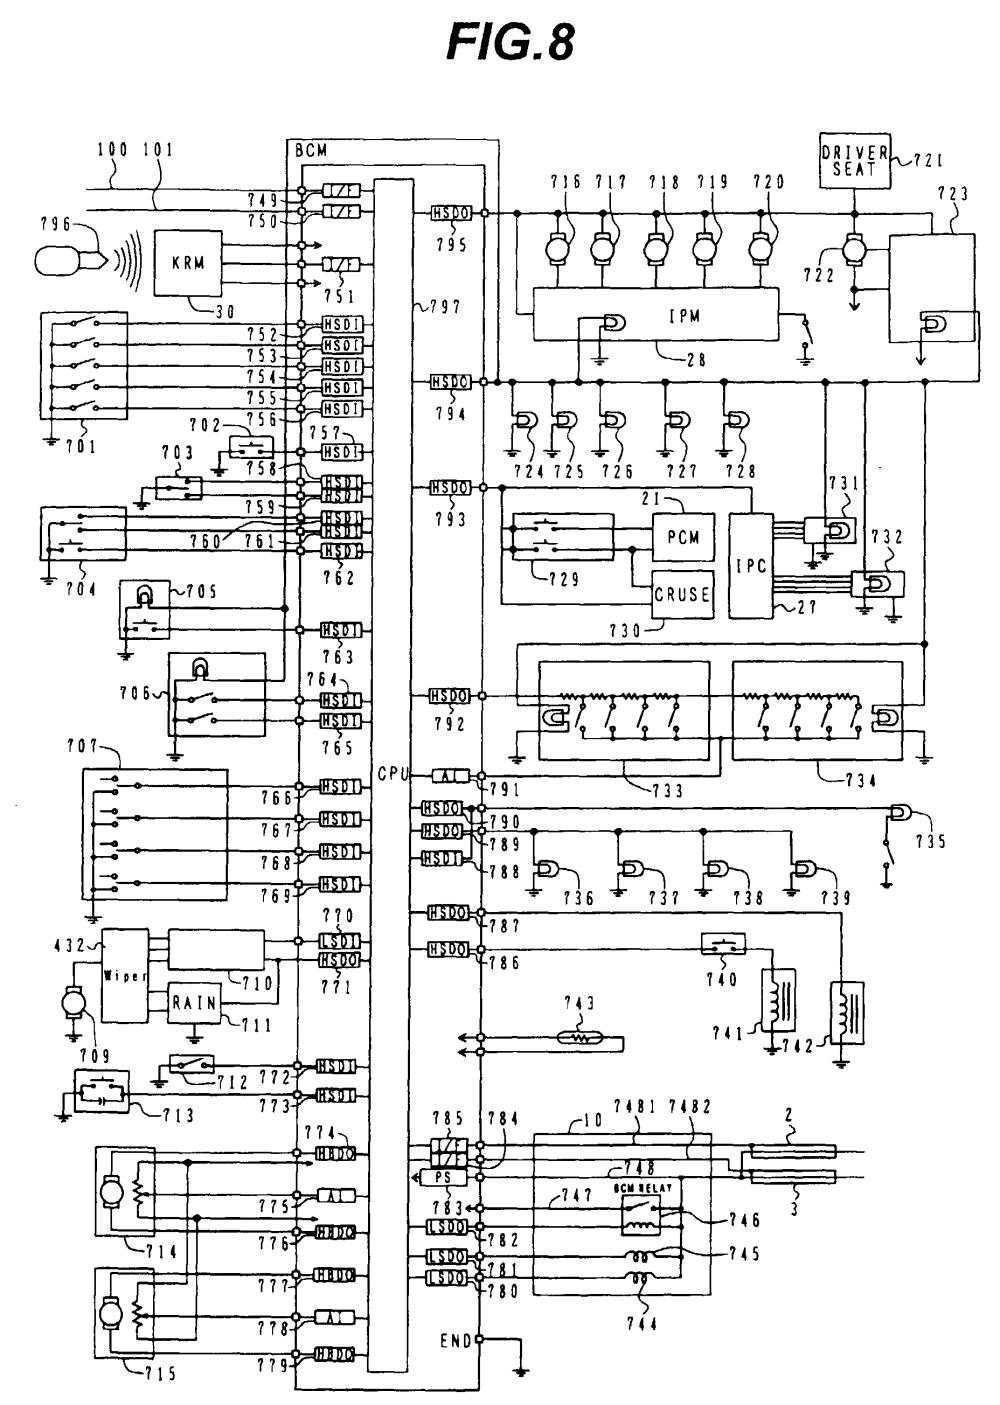 medium resolution of international 9200 wiring diagram wiring diagram third level 1996 international 2674 wiring diagram 2008 international 9200i wiring diagram